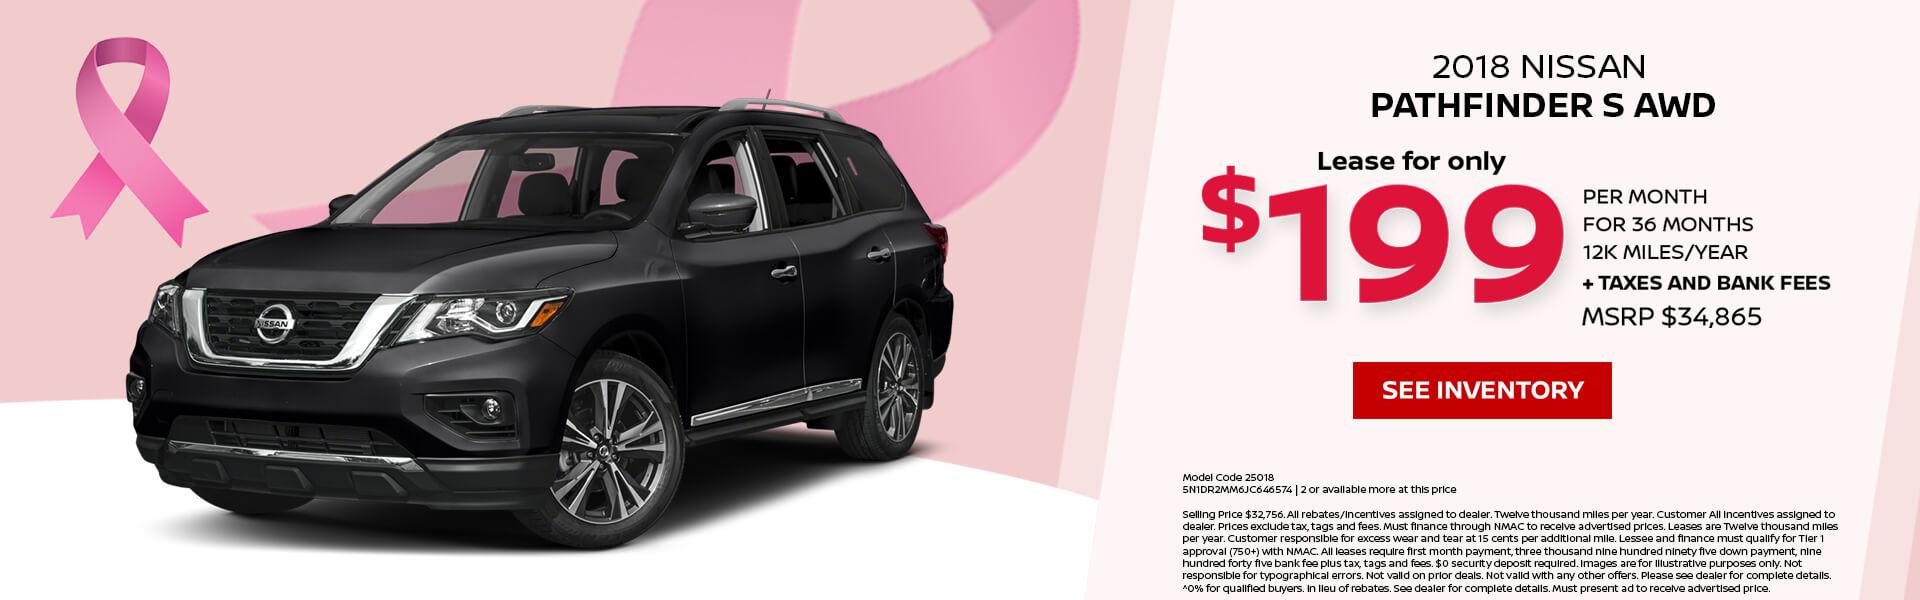 Marvelous Nissan Pathfinder $199 Lease